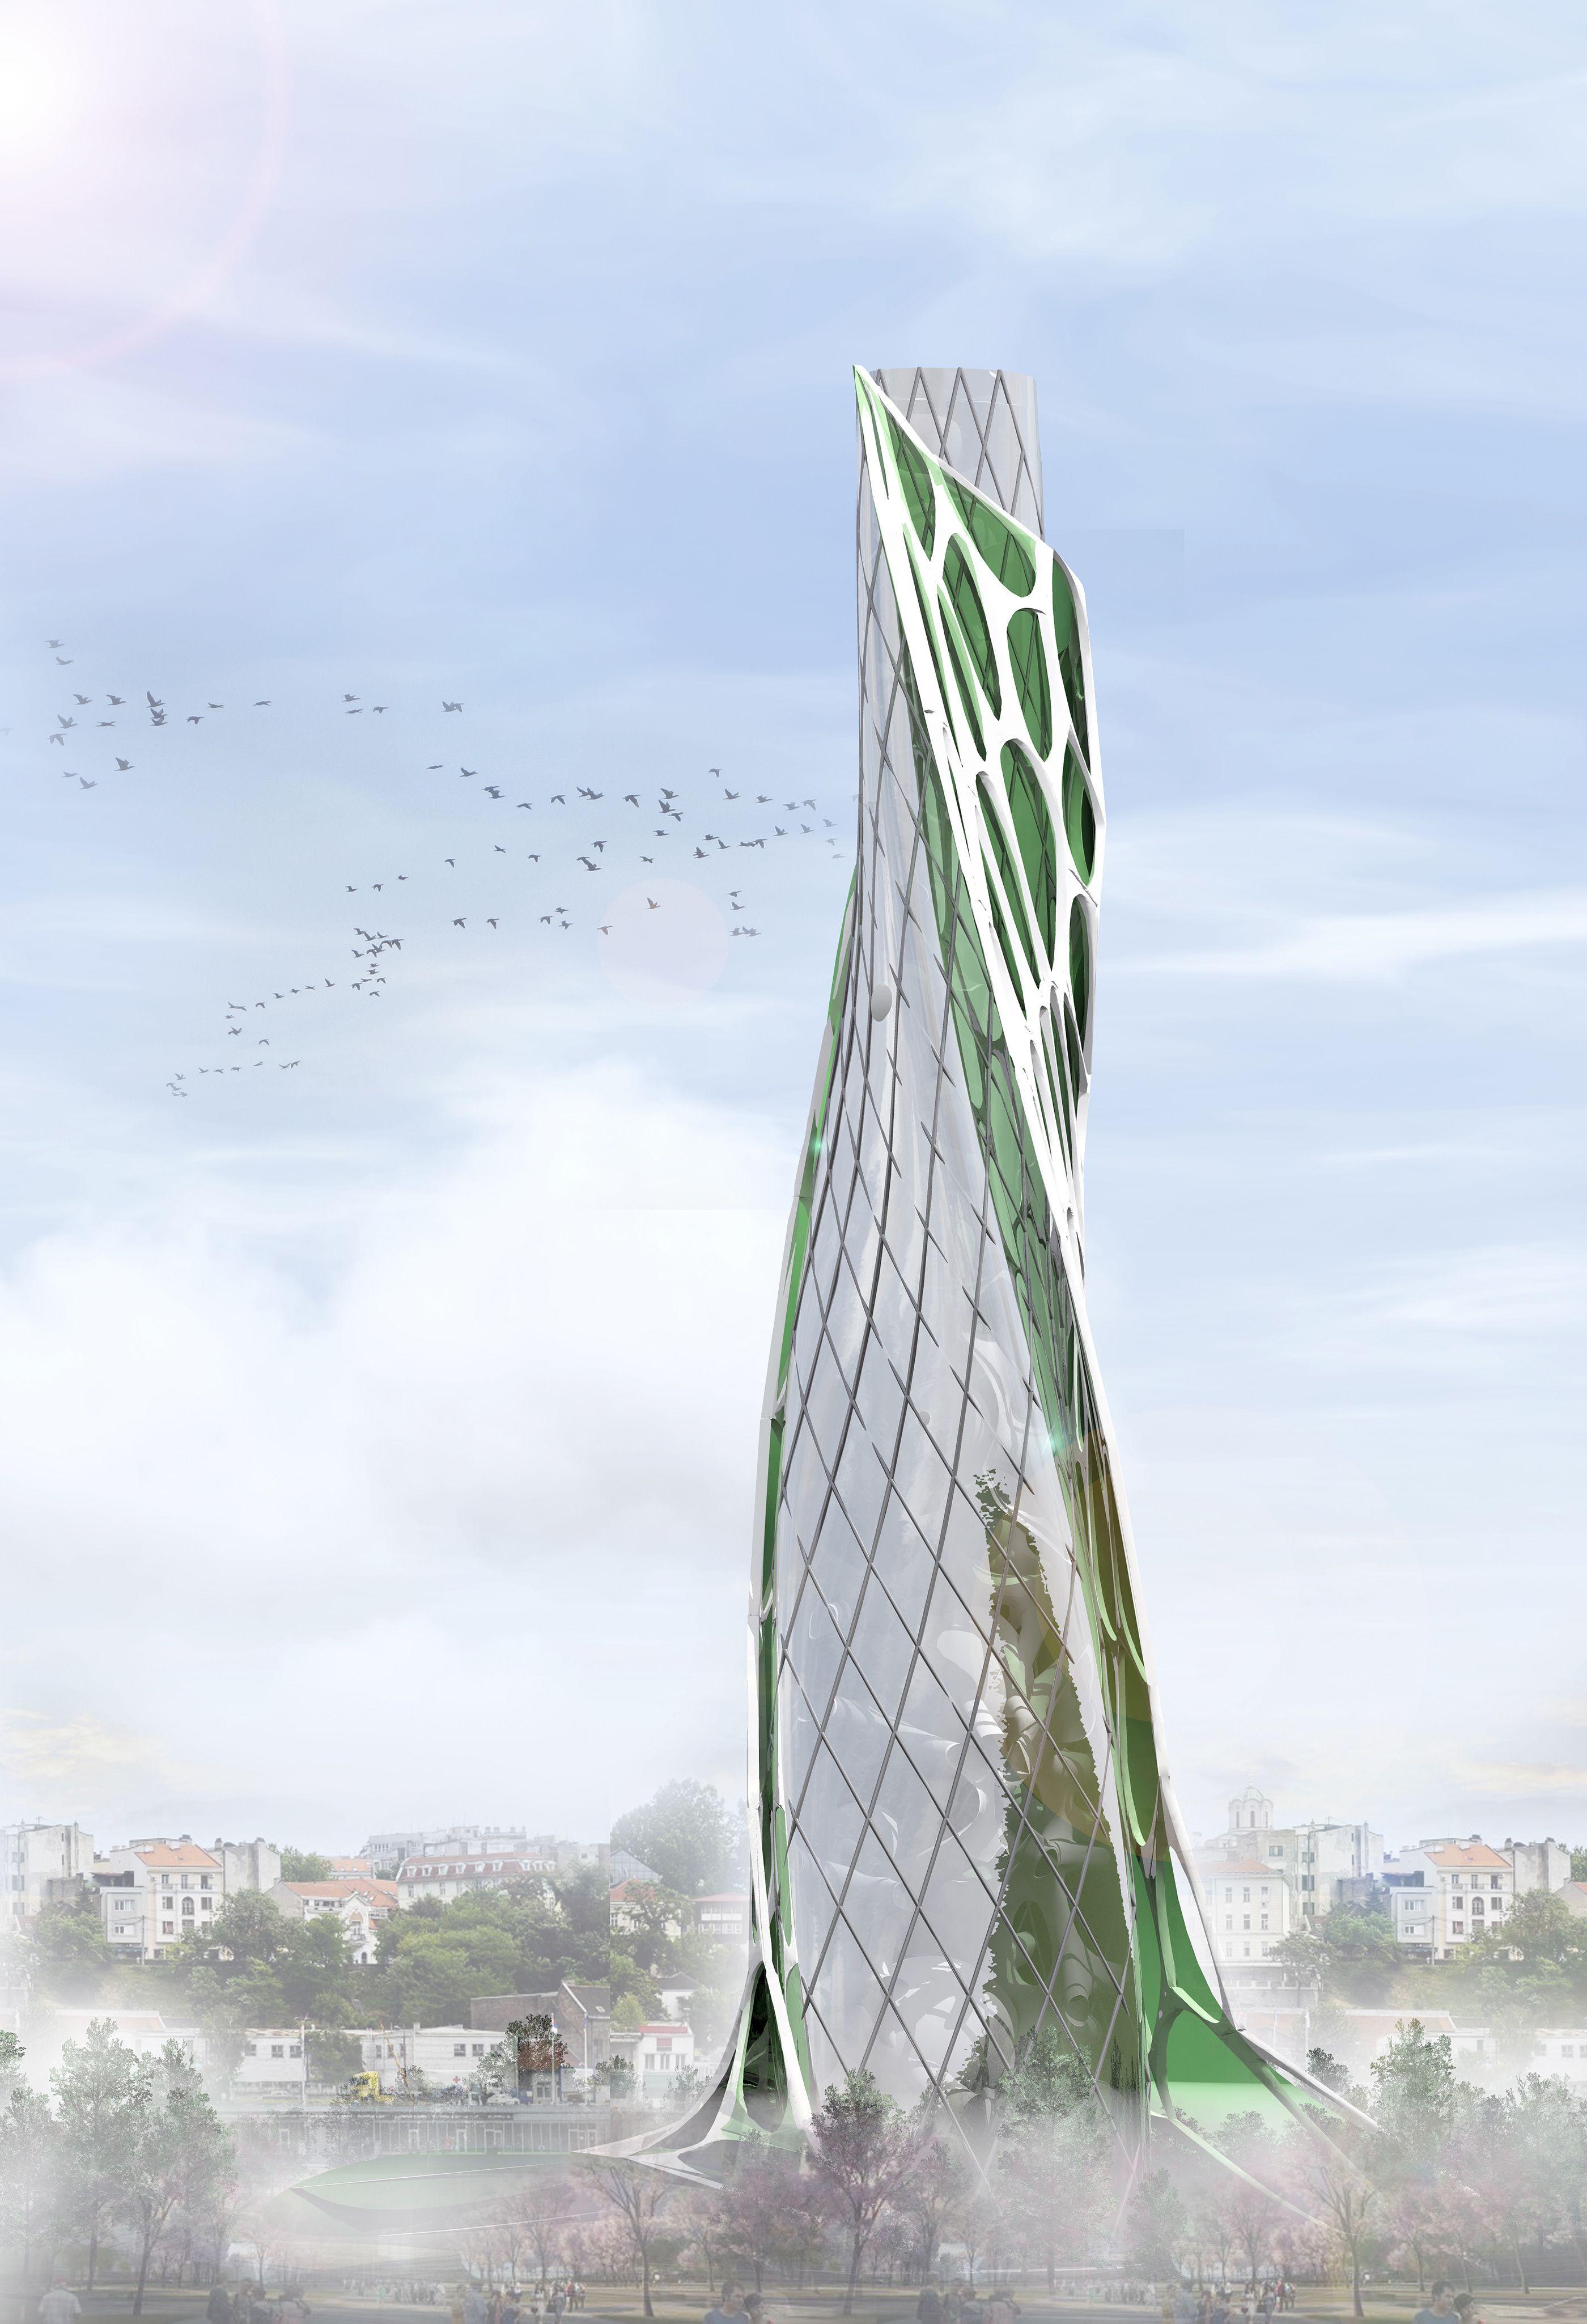 Algae Twisted Tower By Aleksandra Aleksić The Algae Twisted Tower Impressive Urban Complex Oackapon Salachai